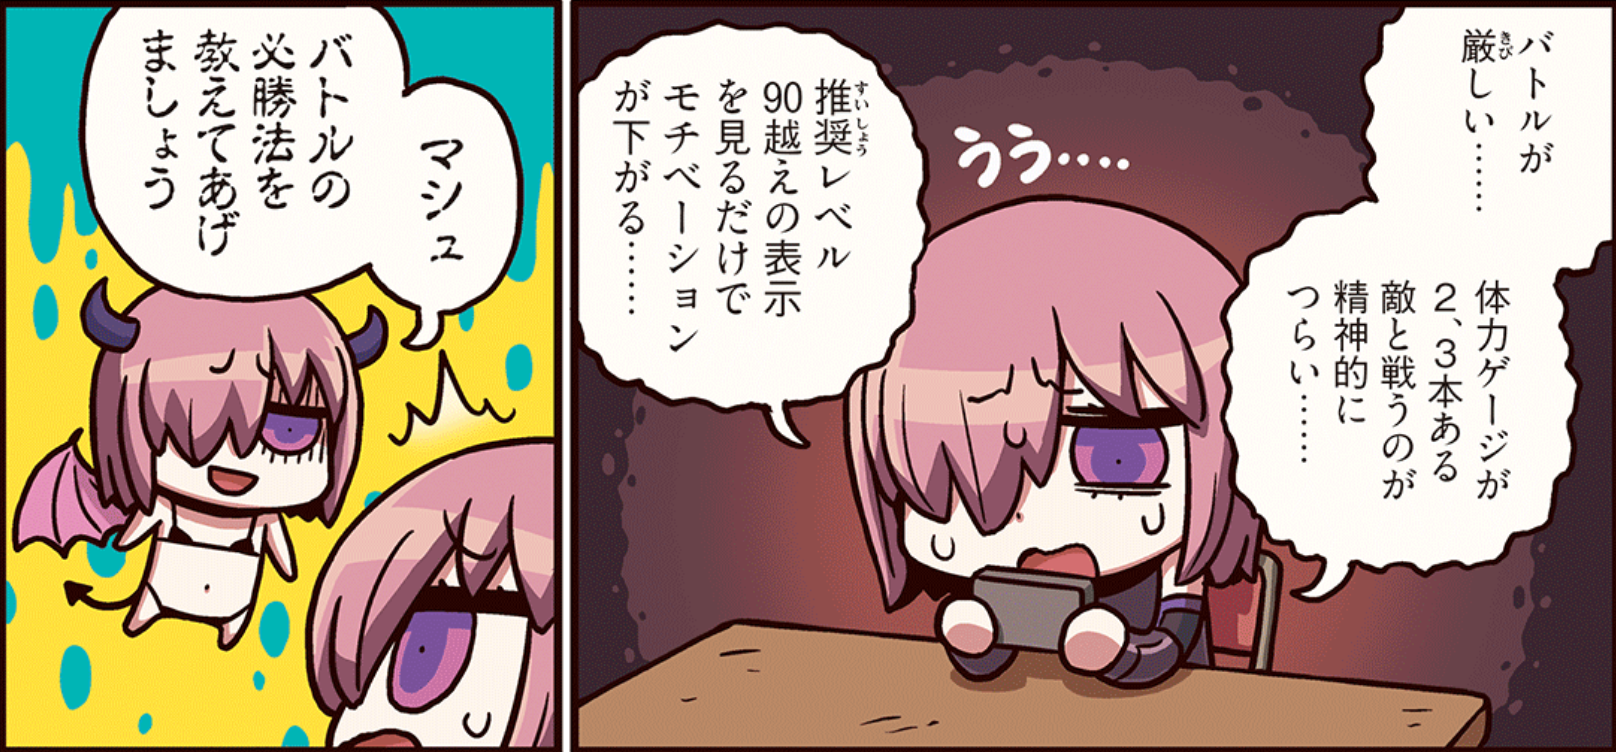 【FGO】今回のギミック全く意味わからないんだがみんなどうやってんの?